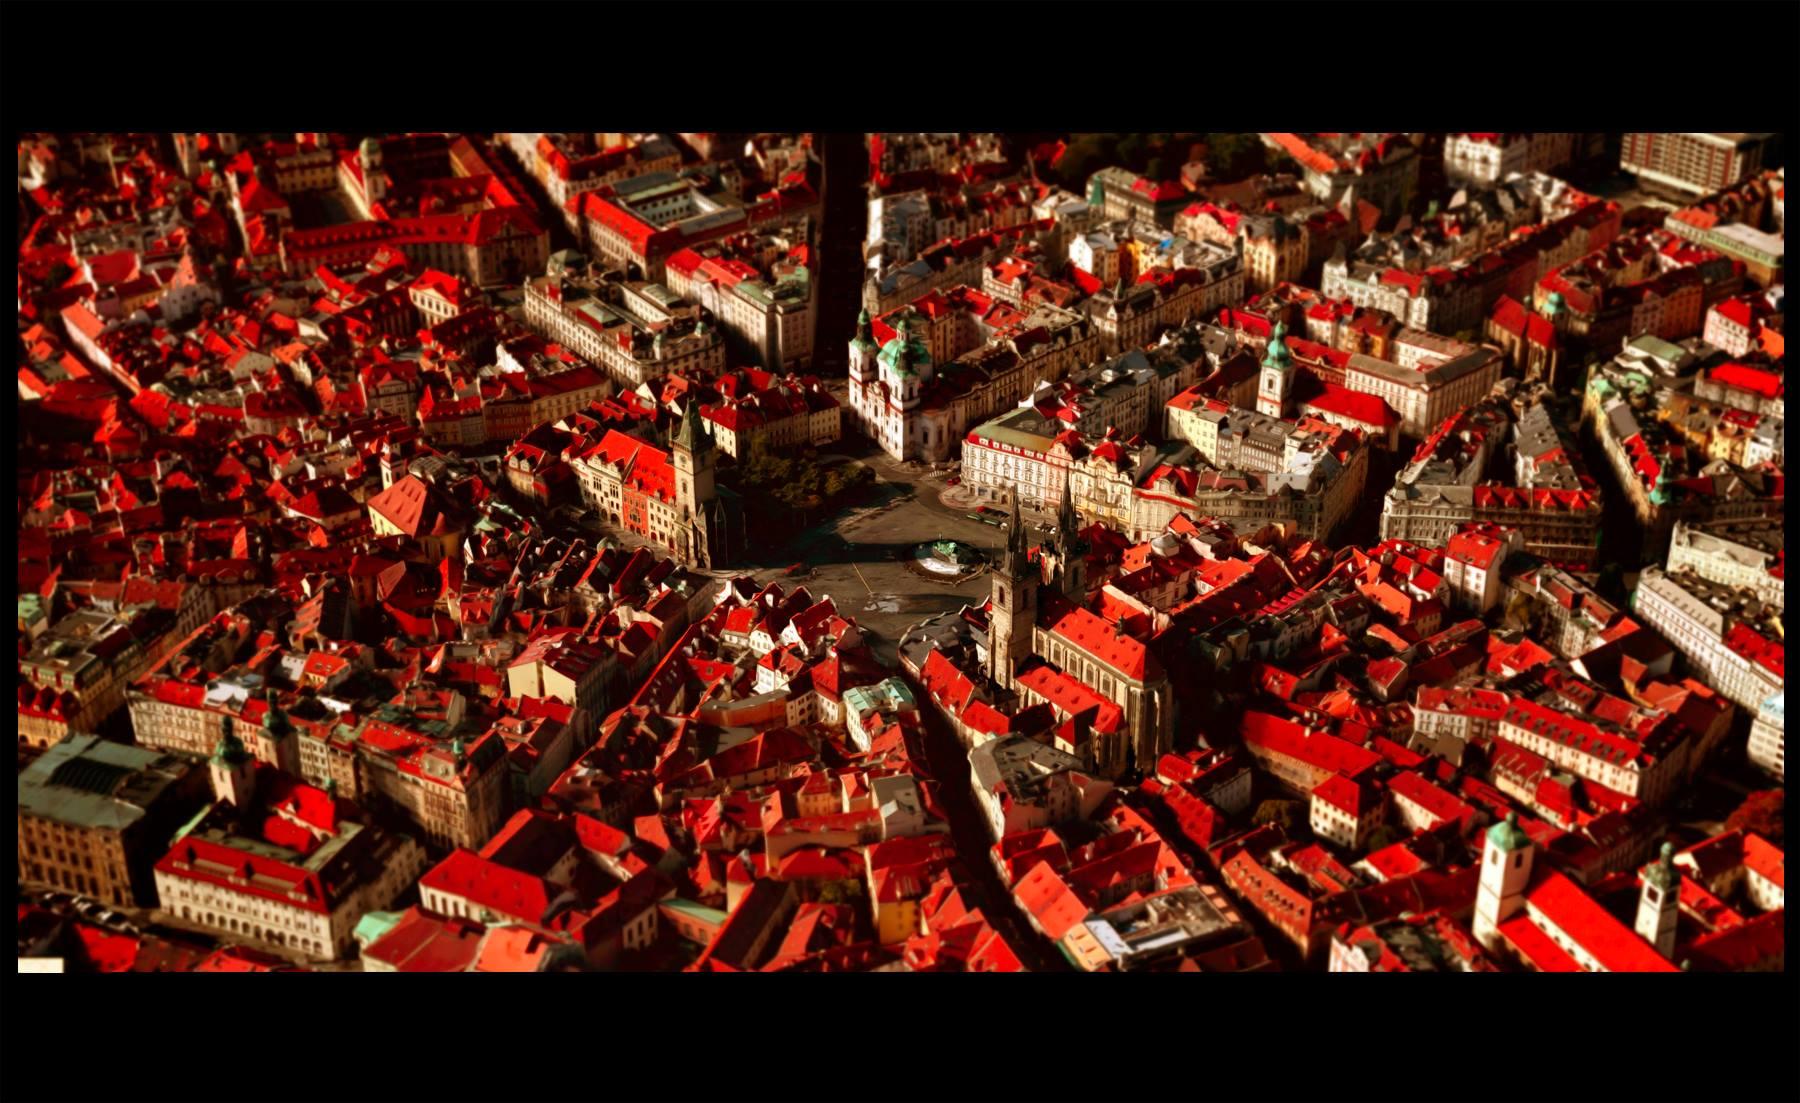 cinemascapes: my street view edition - Praga